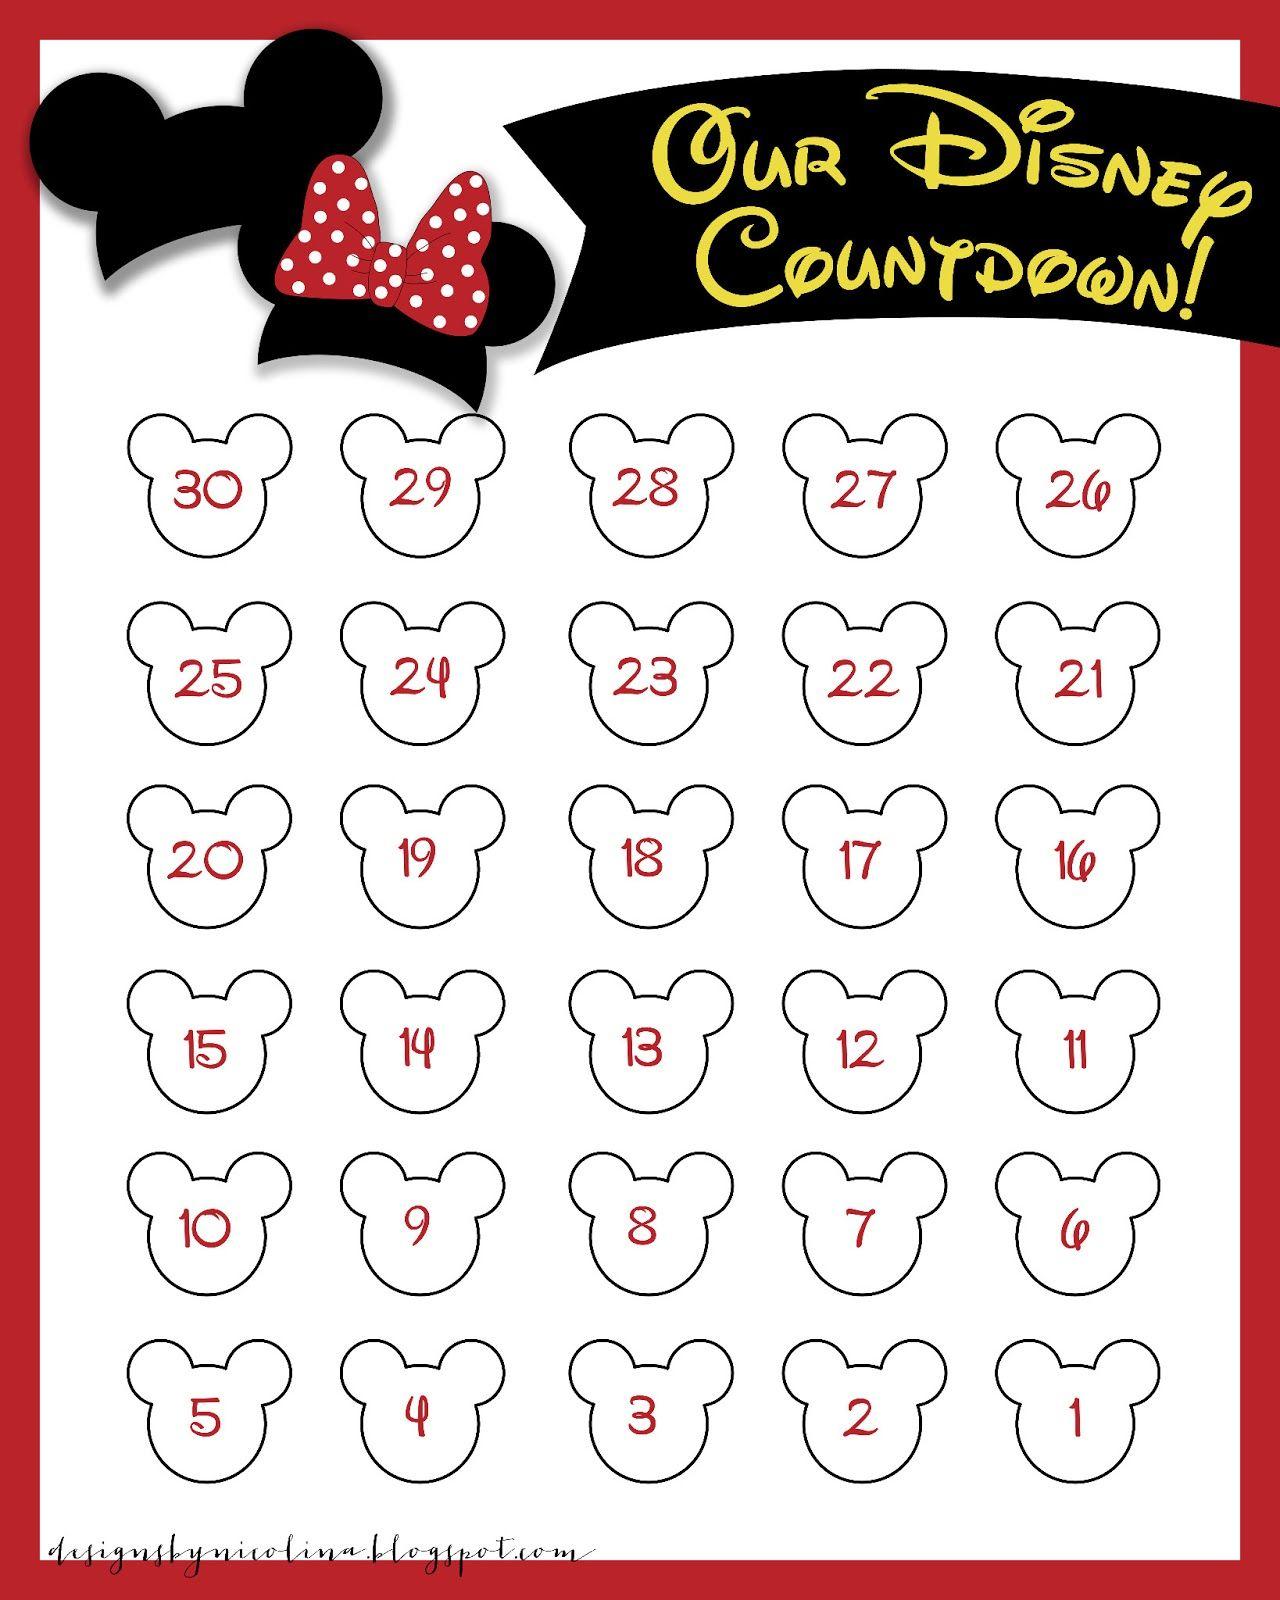 Disneyland Countdown Calendar   Designsnicolina: Disney